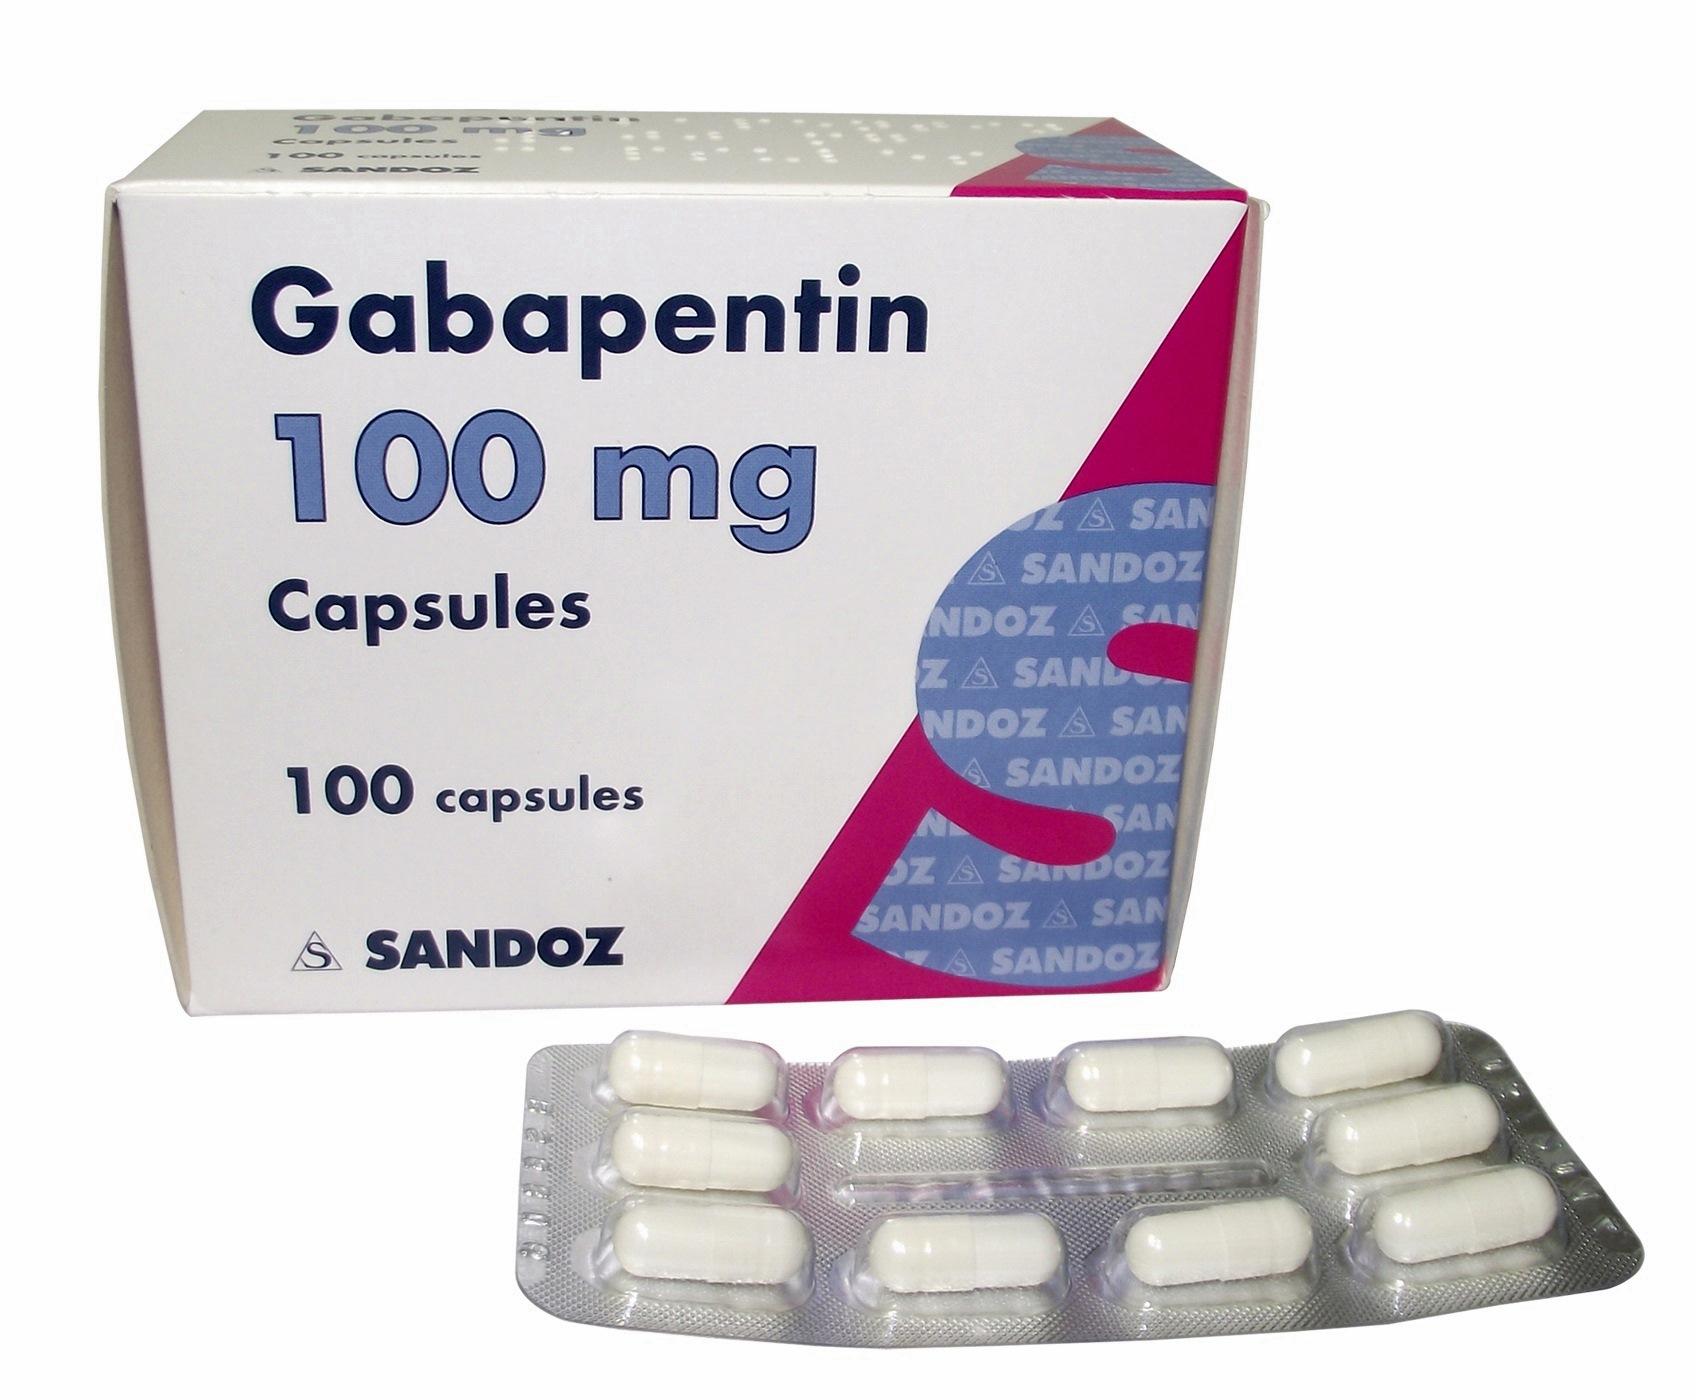 Gabapentin treat anxiety